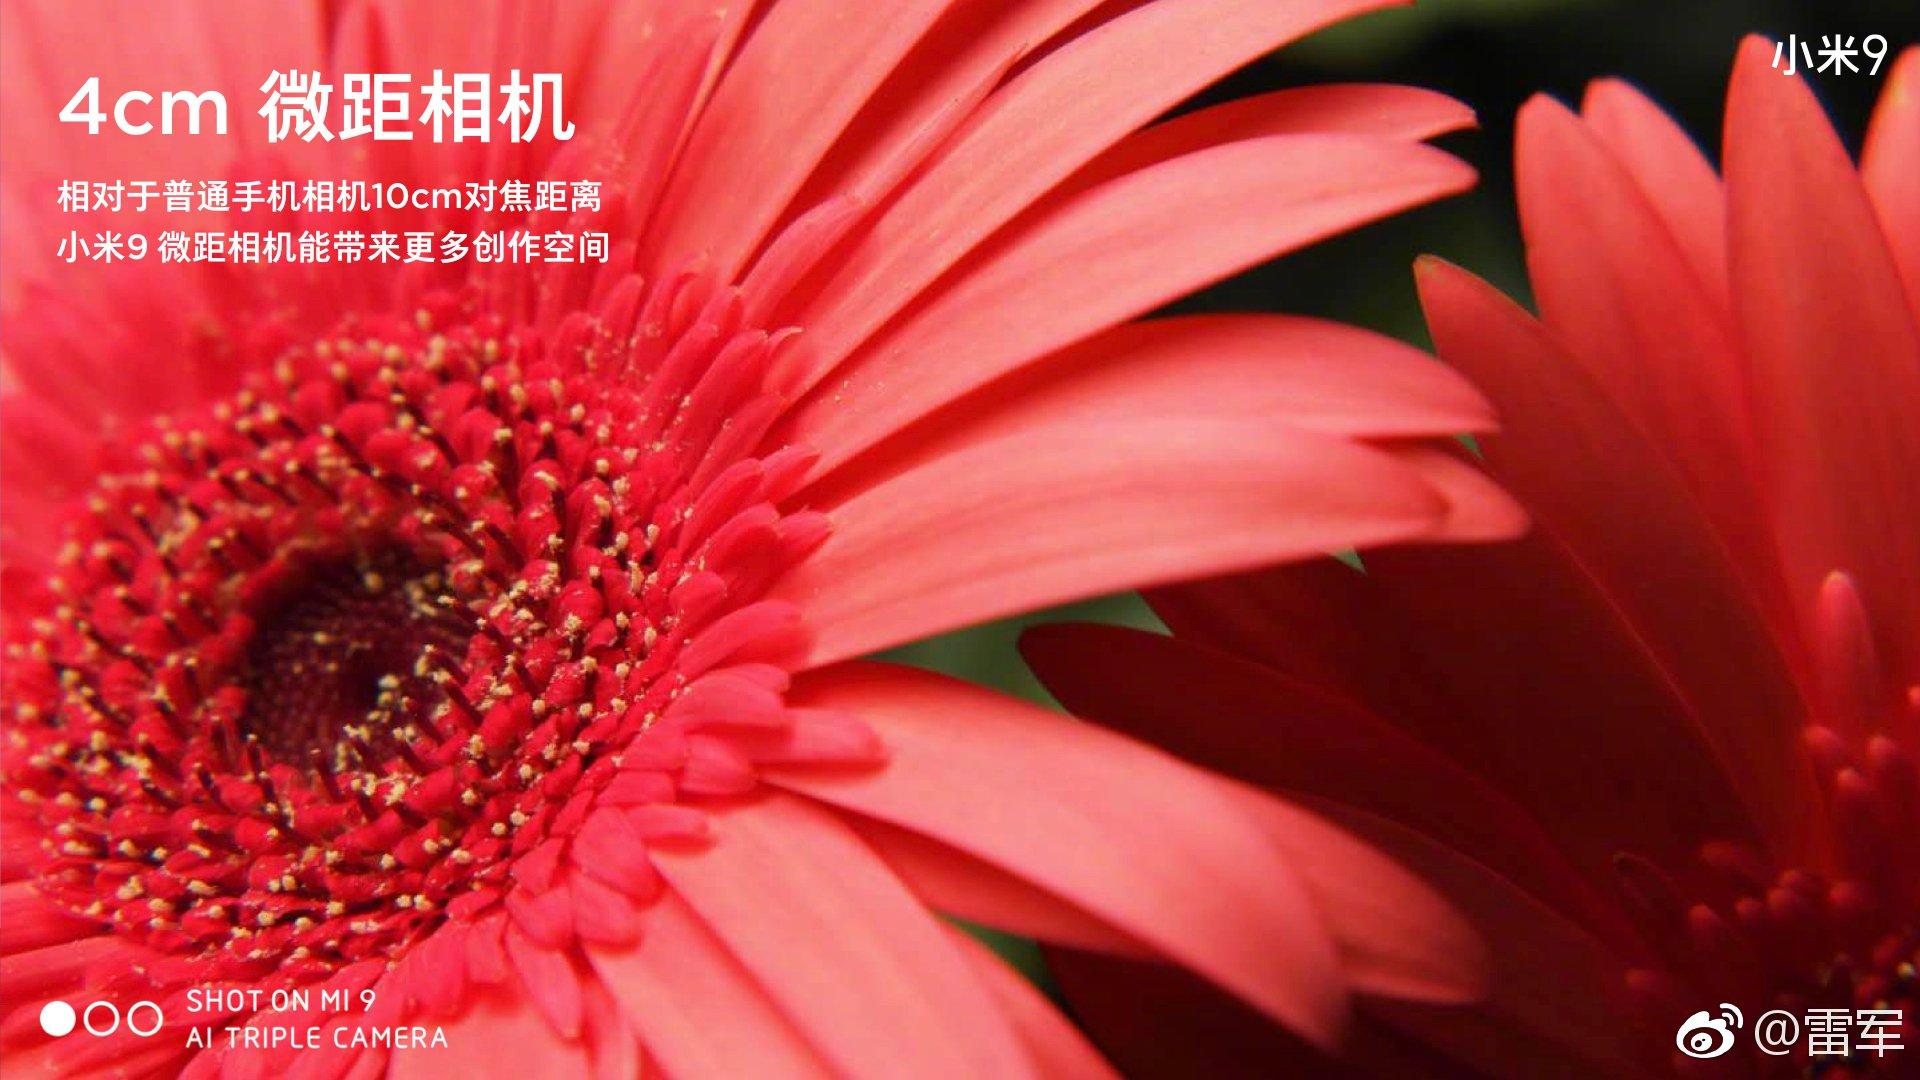 Xiaomi Mi 9 Complete Specifications 5